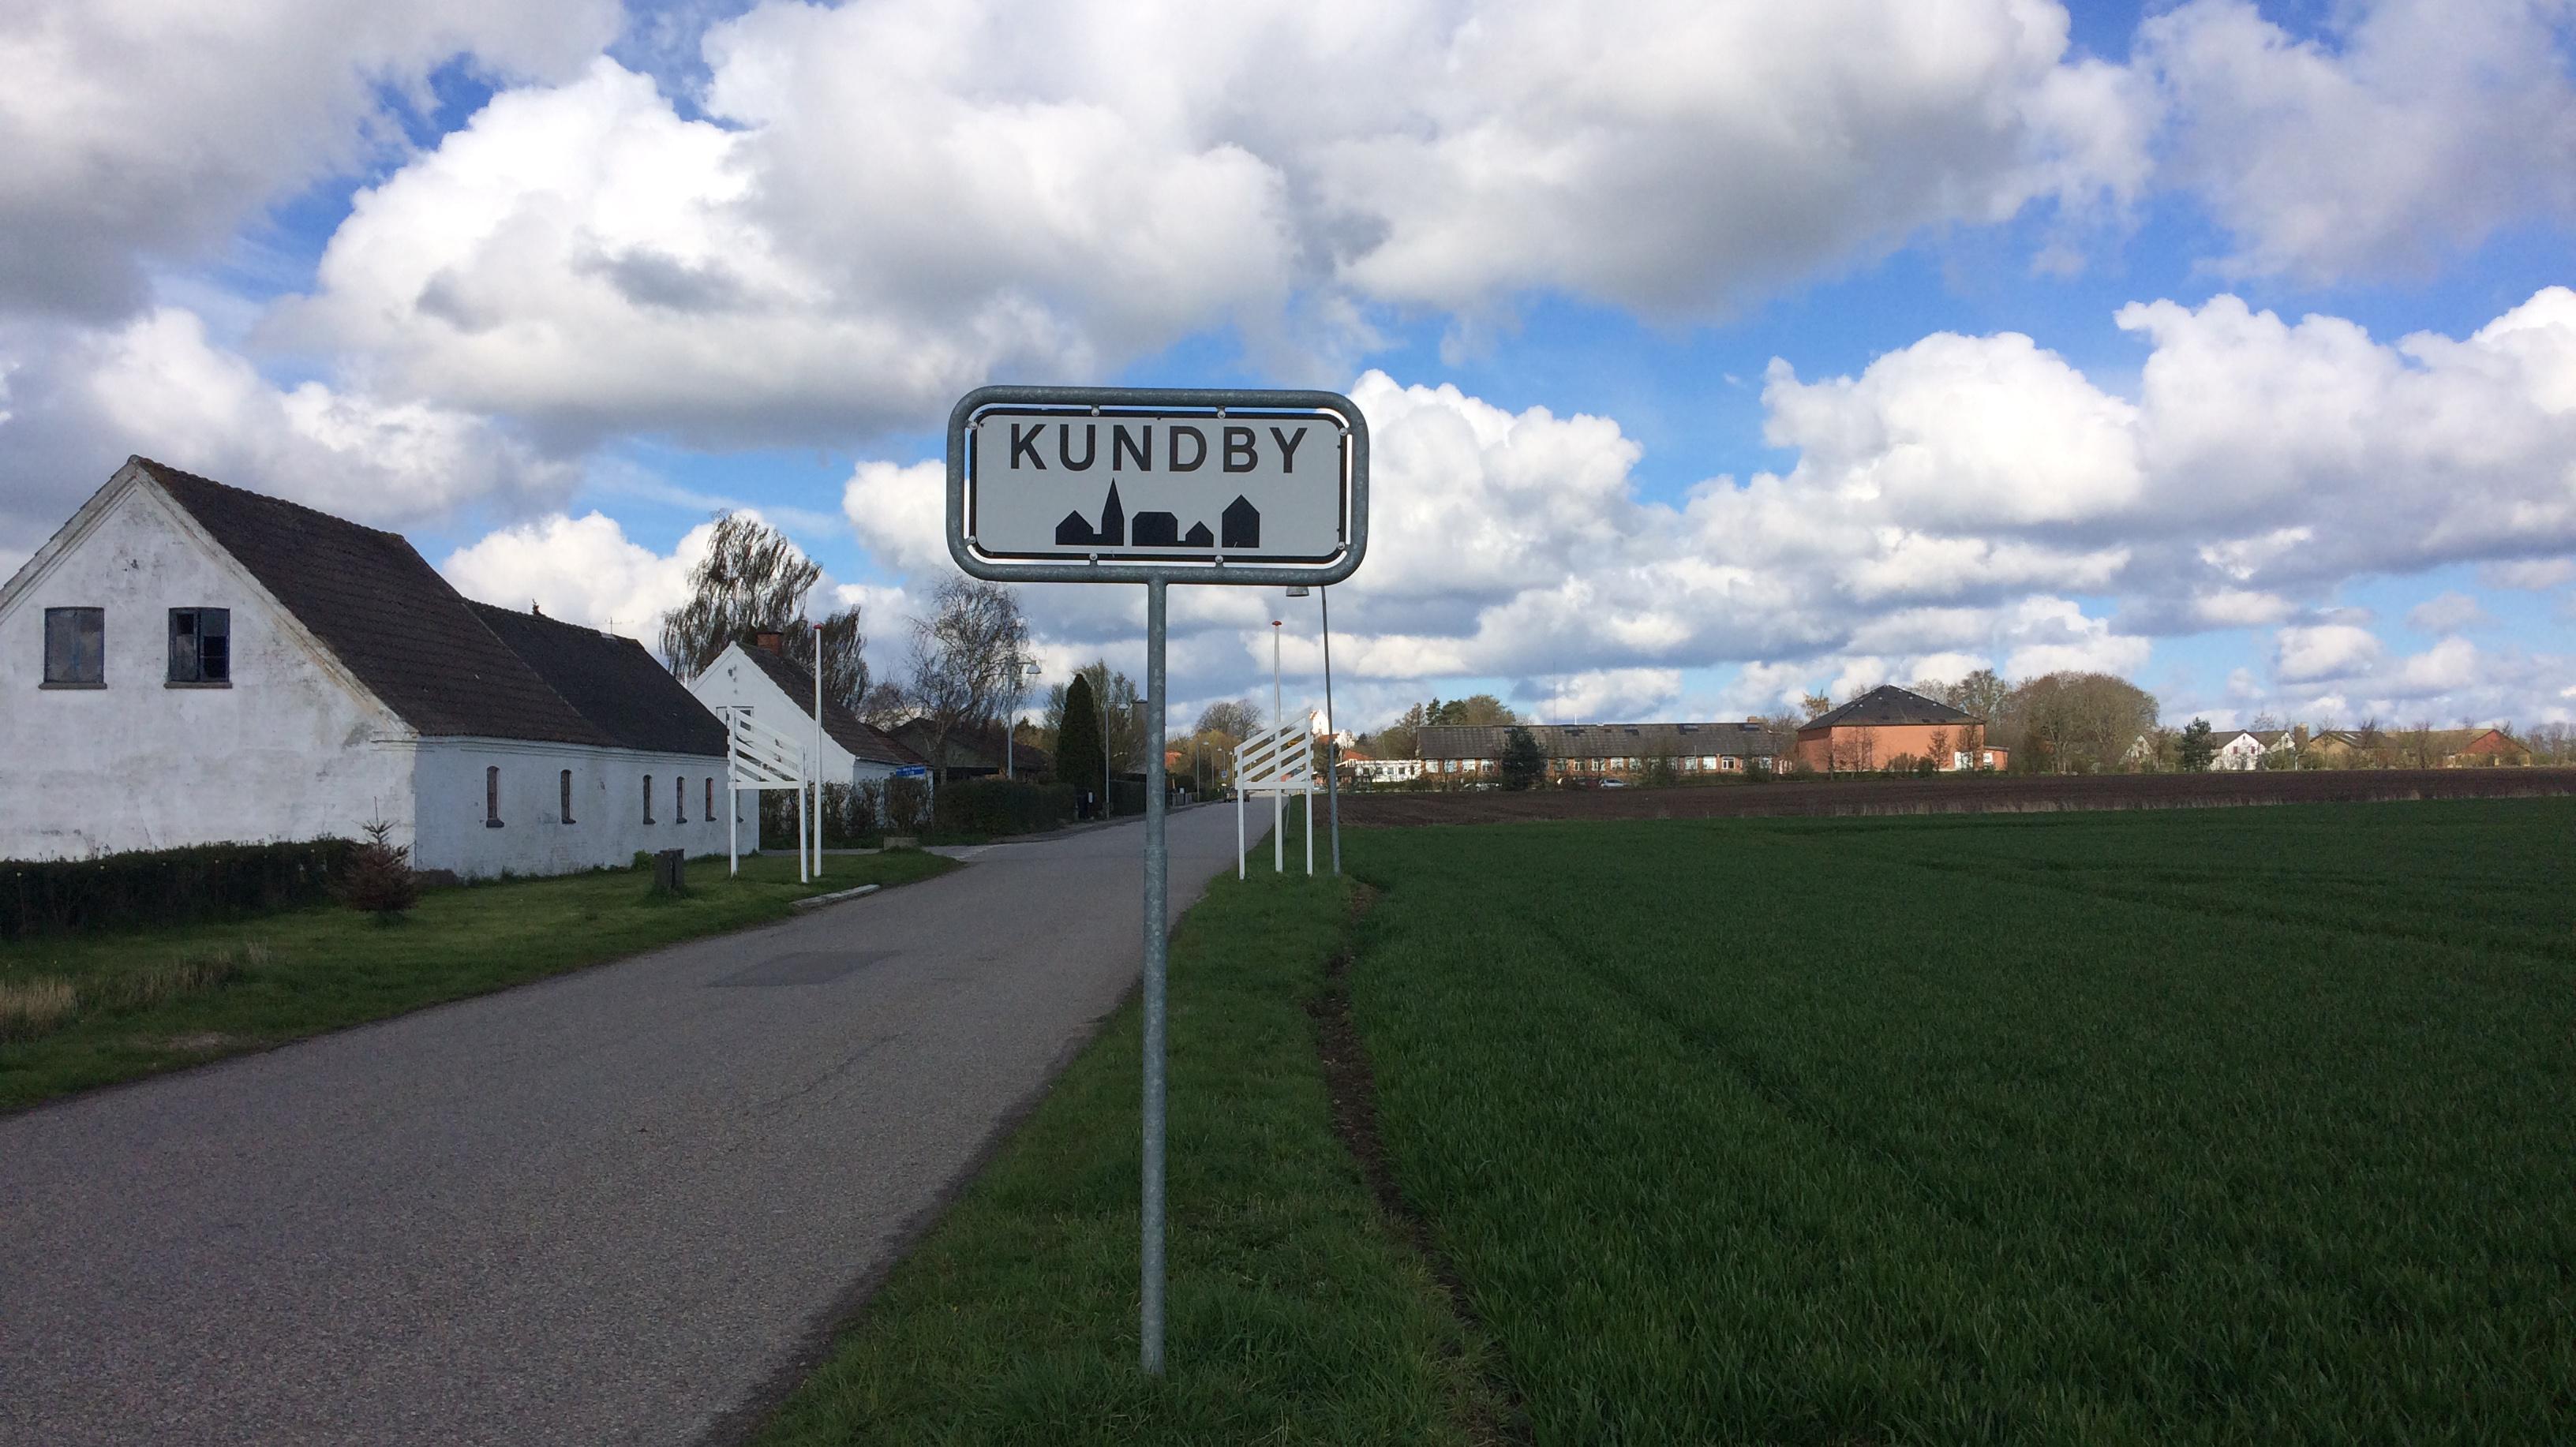 kundby.jpg